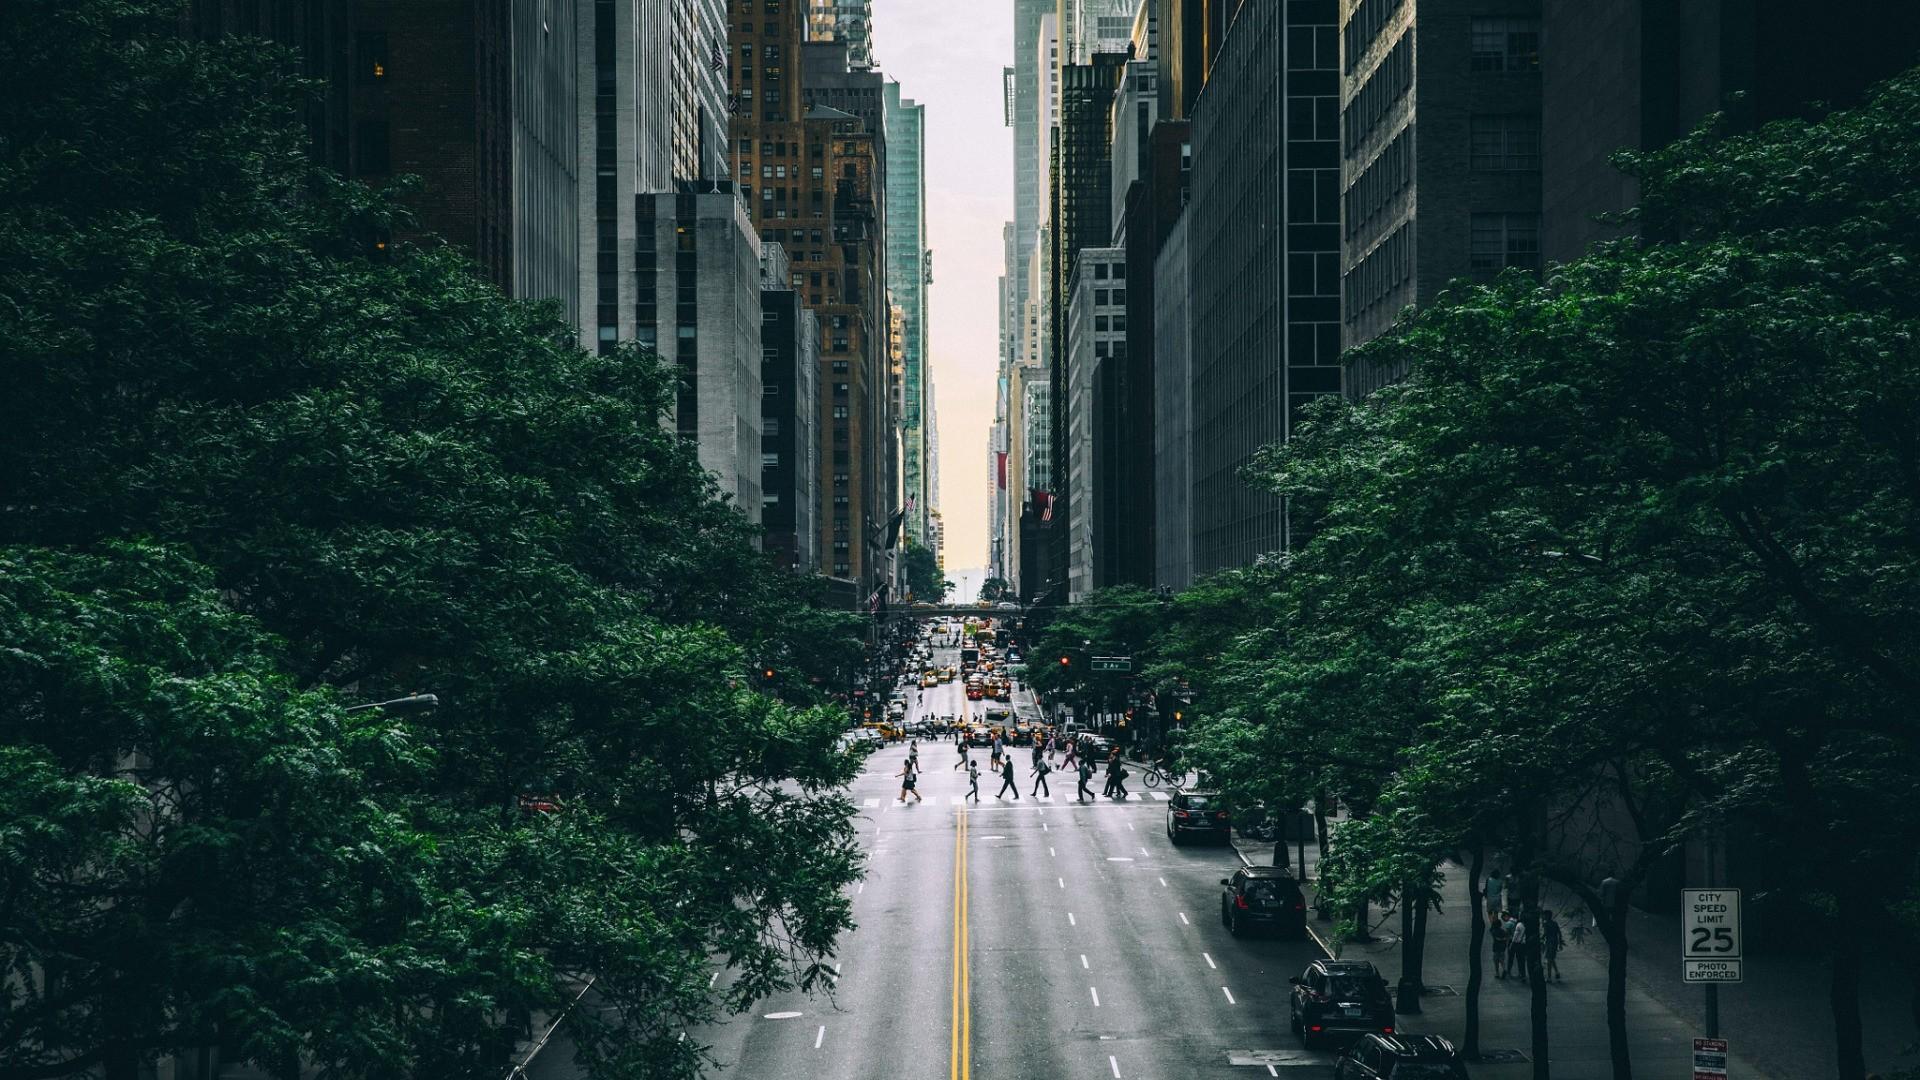 New York Street Background